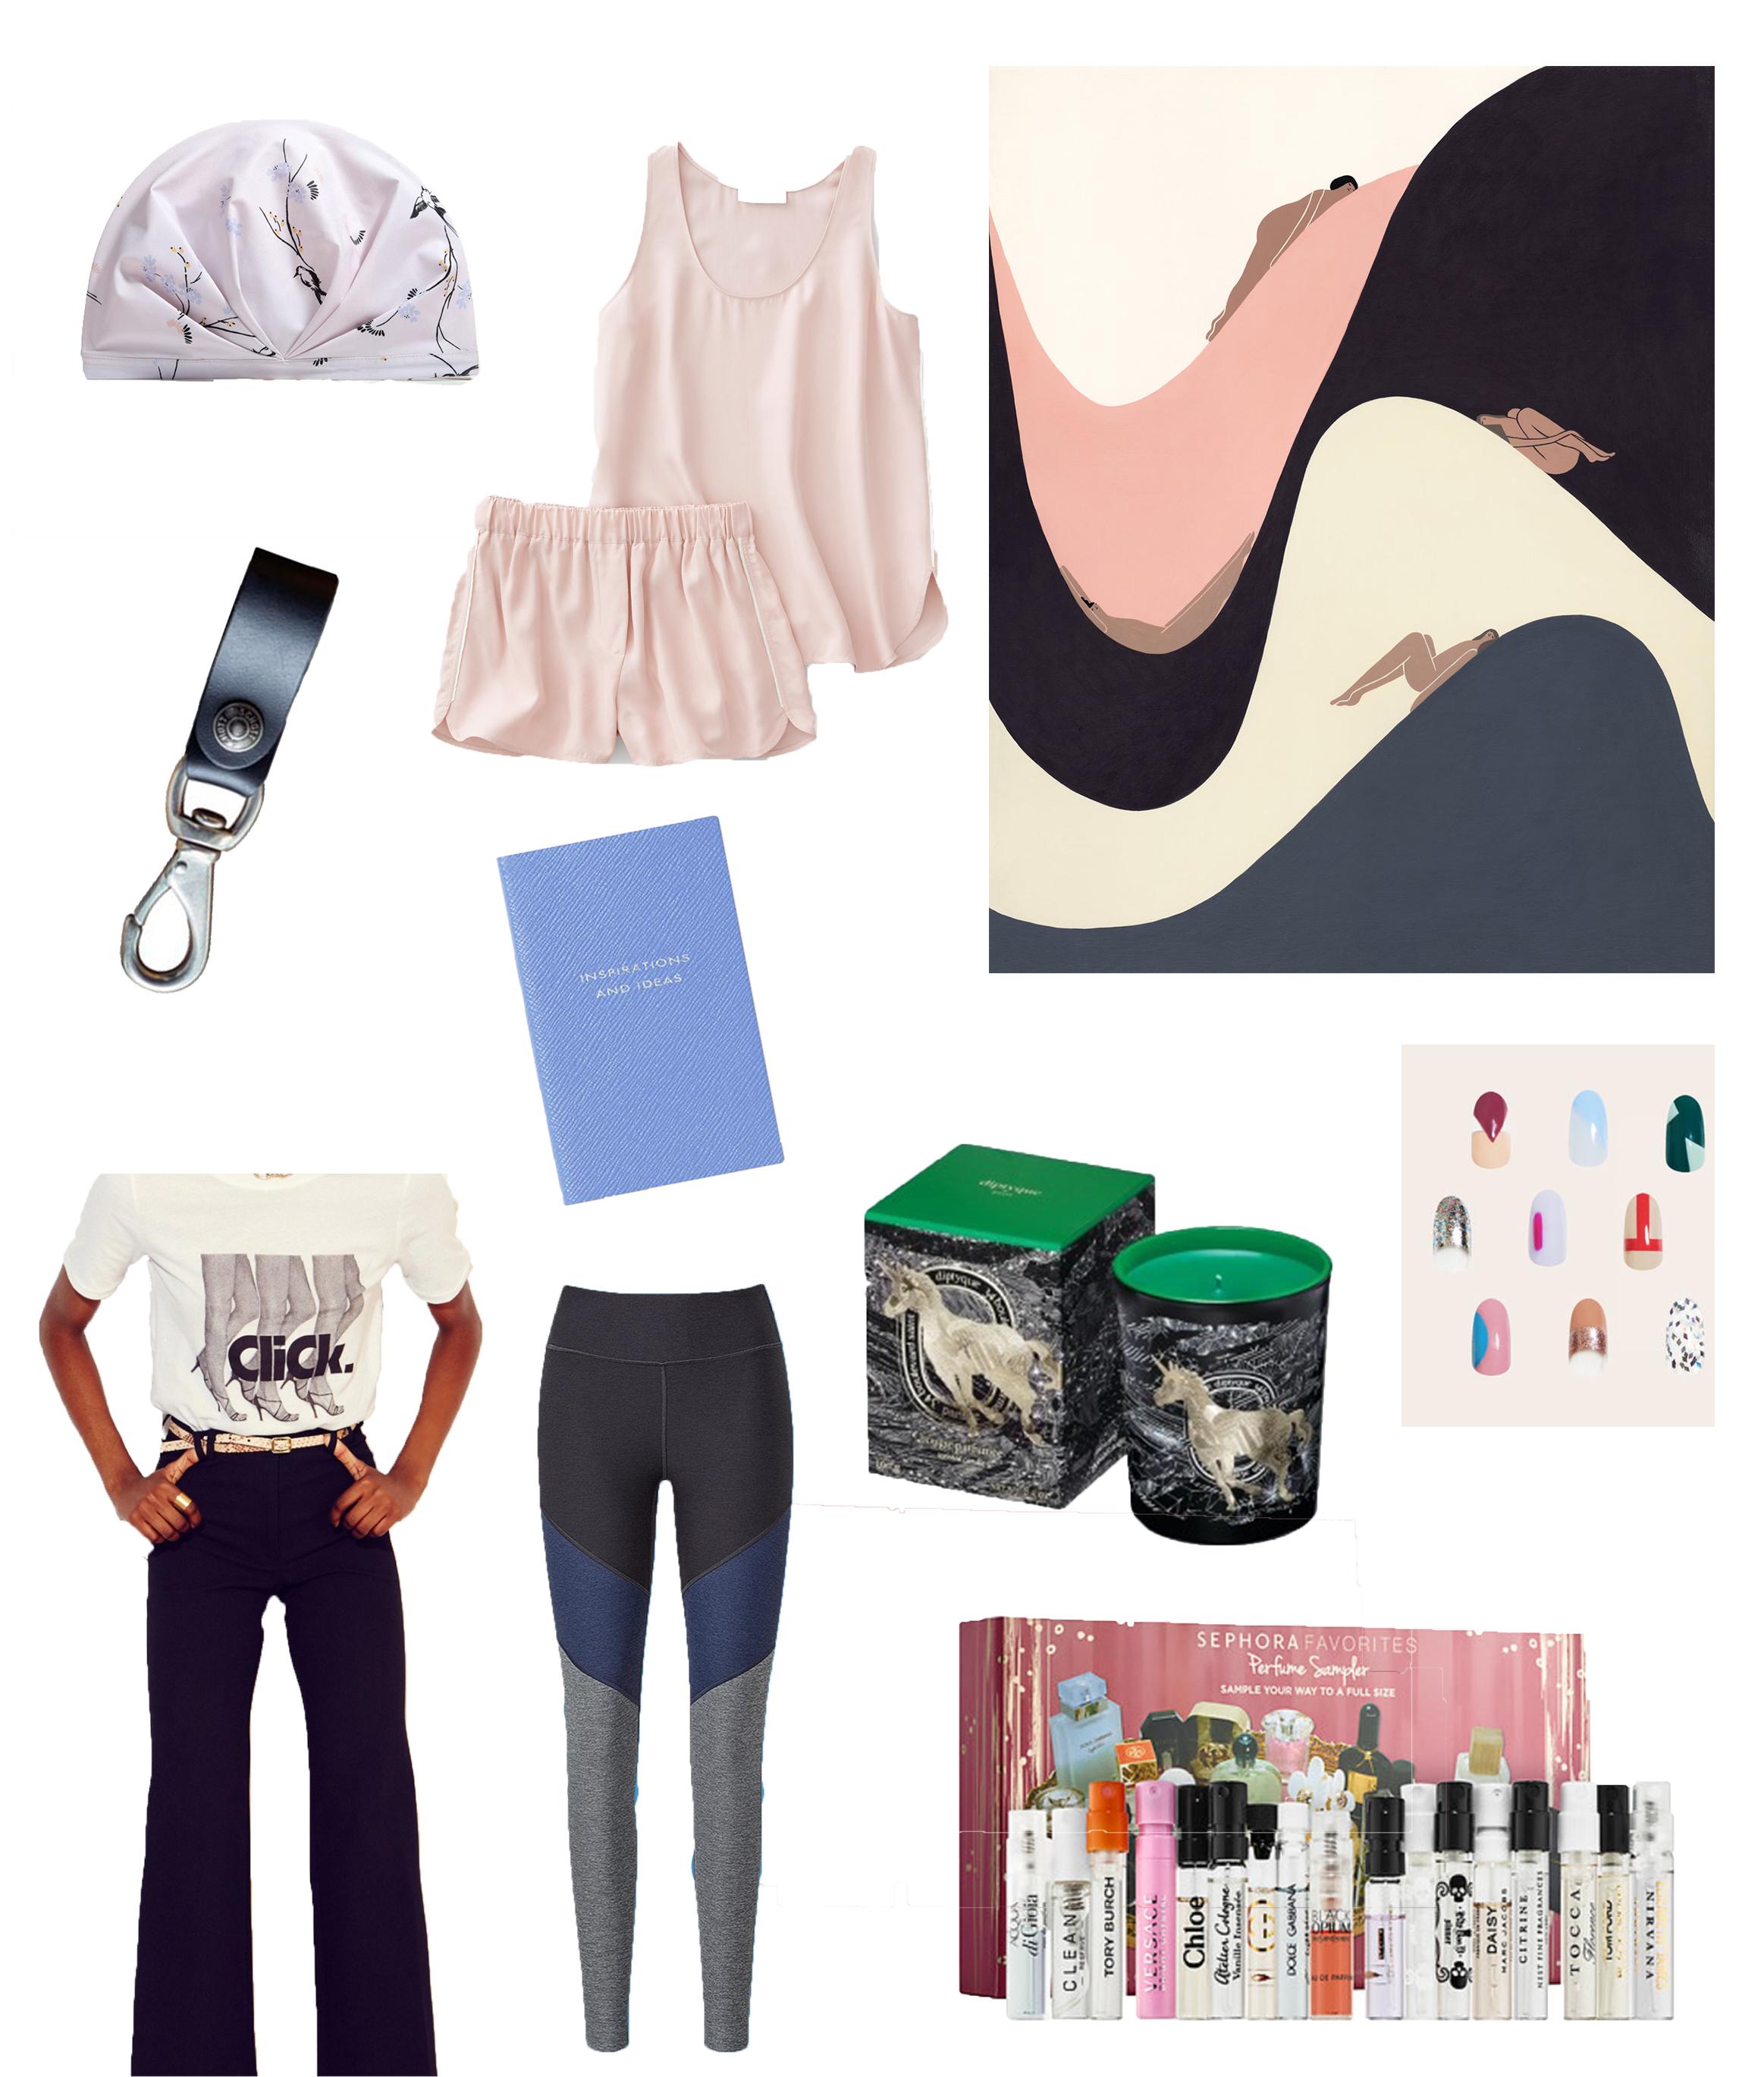 Image Sources: Shhhower Cap; Everlane; Laura Berger; Schott NYC; Smythson; Diptyque; Paint Box; Monogram Studio; Outdoor Voices; Sephora.